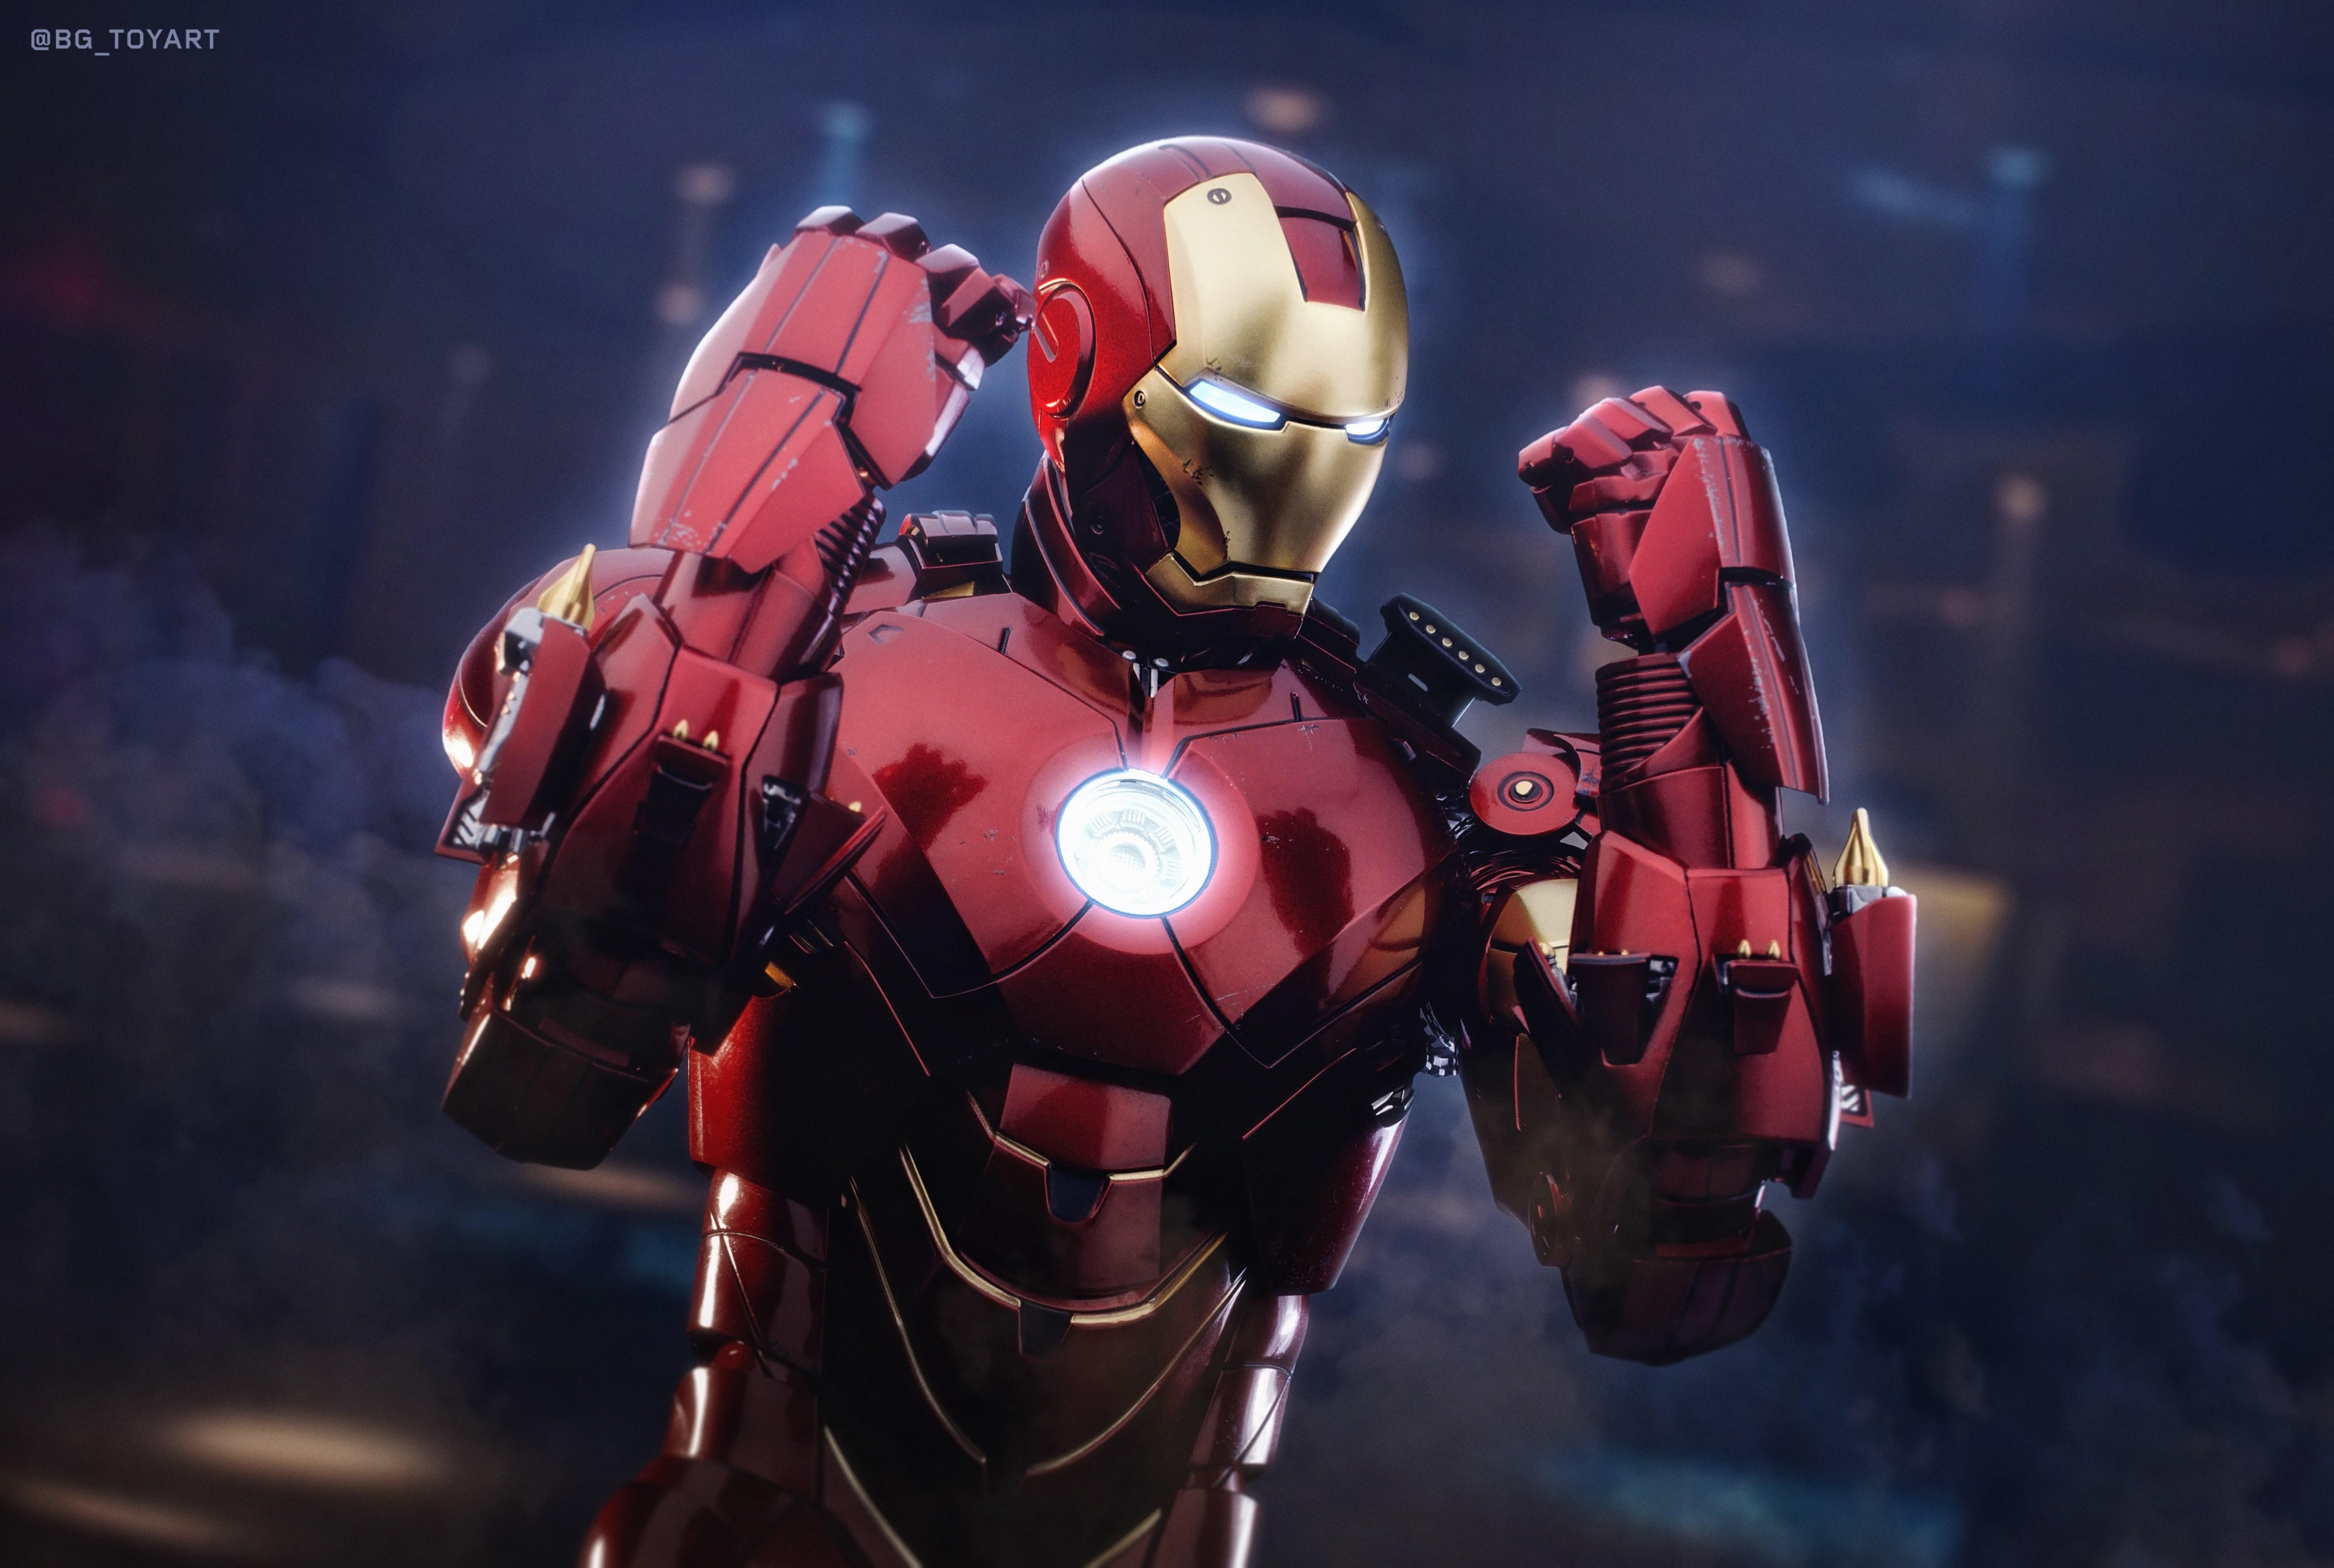 Iron Man Mark 4 Suit 5k, HD Superheroes, 4k Wallpapers ...  Iron Man Mark 4...